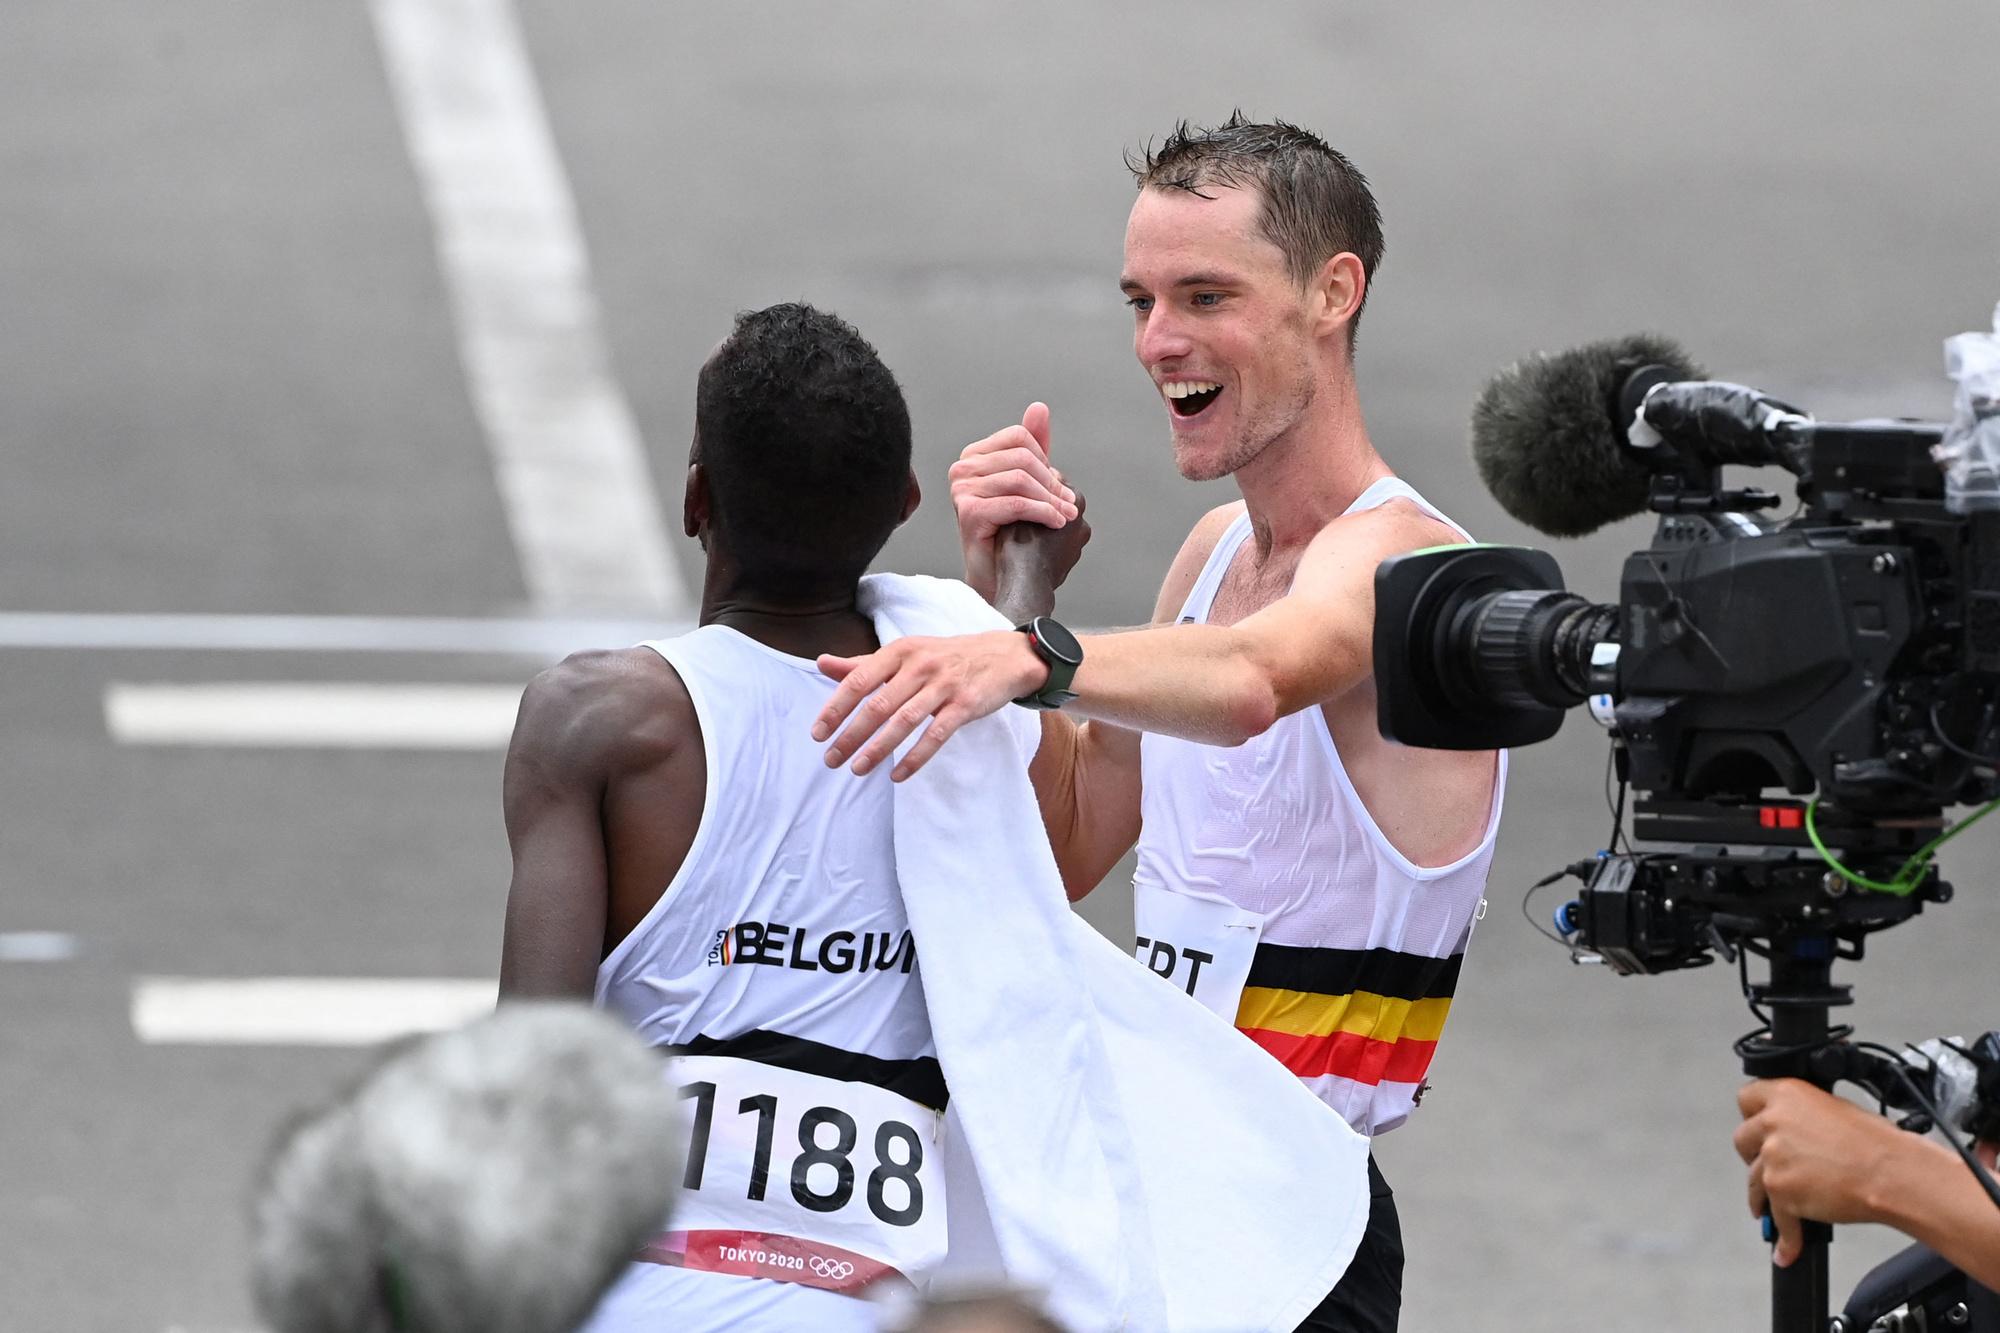 Tevreden marathonlopers Bashir Abdi en Koen Naert, Getty Images